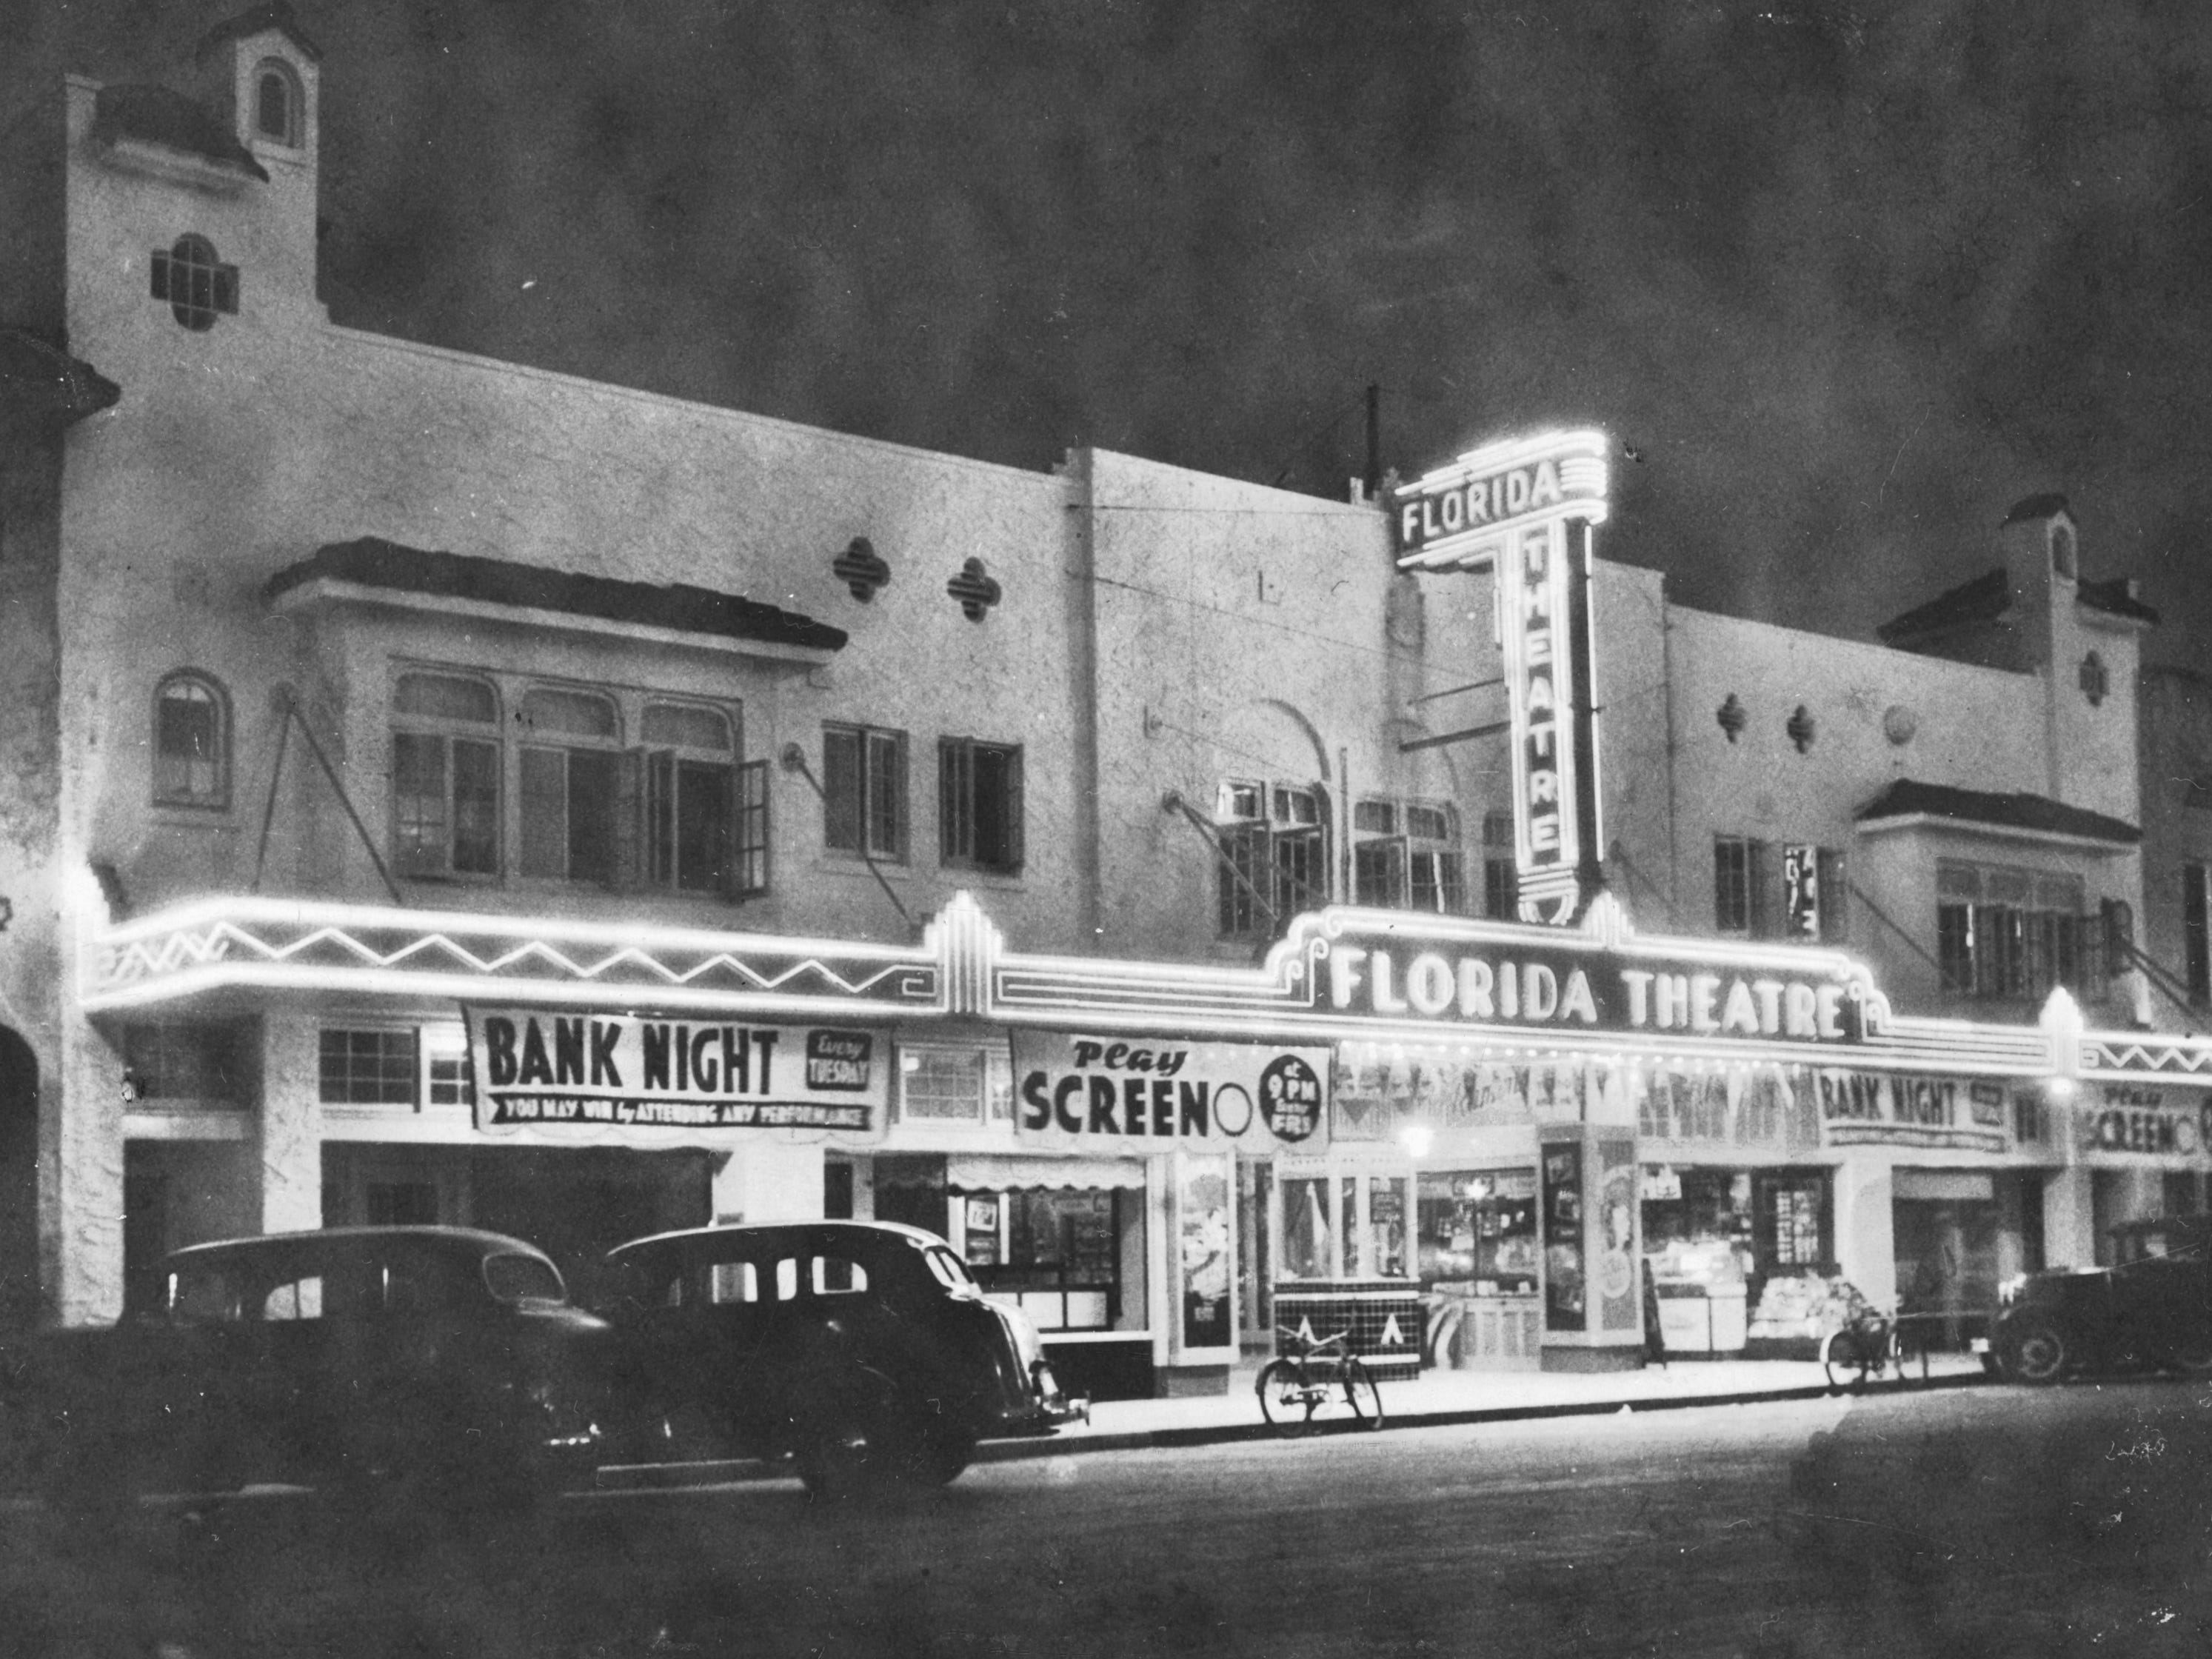 Florida Theatre at night, 1940s